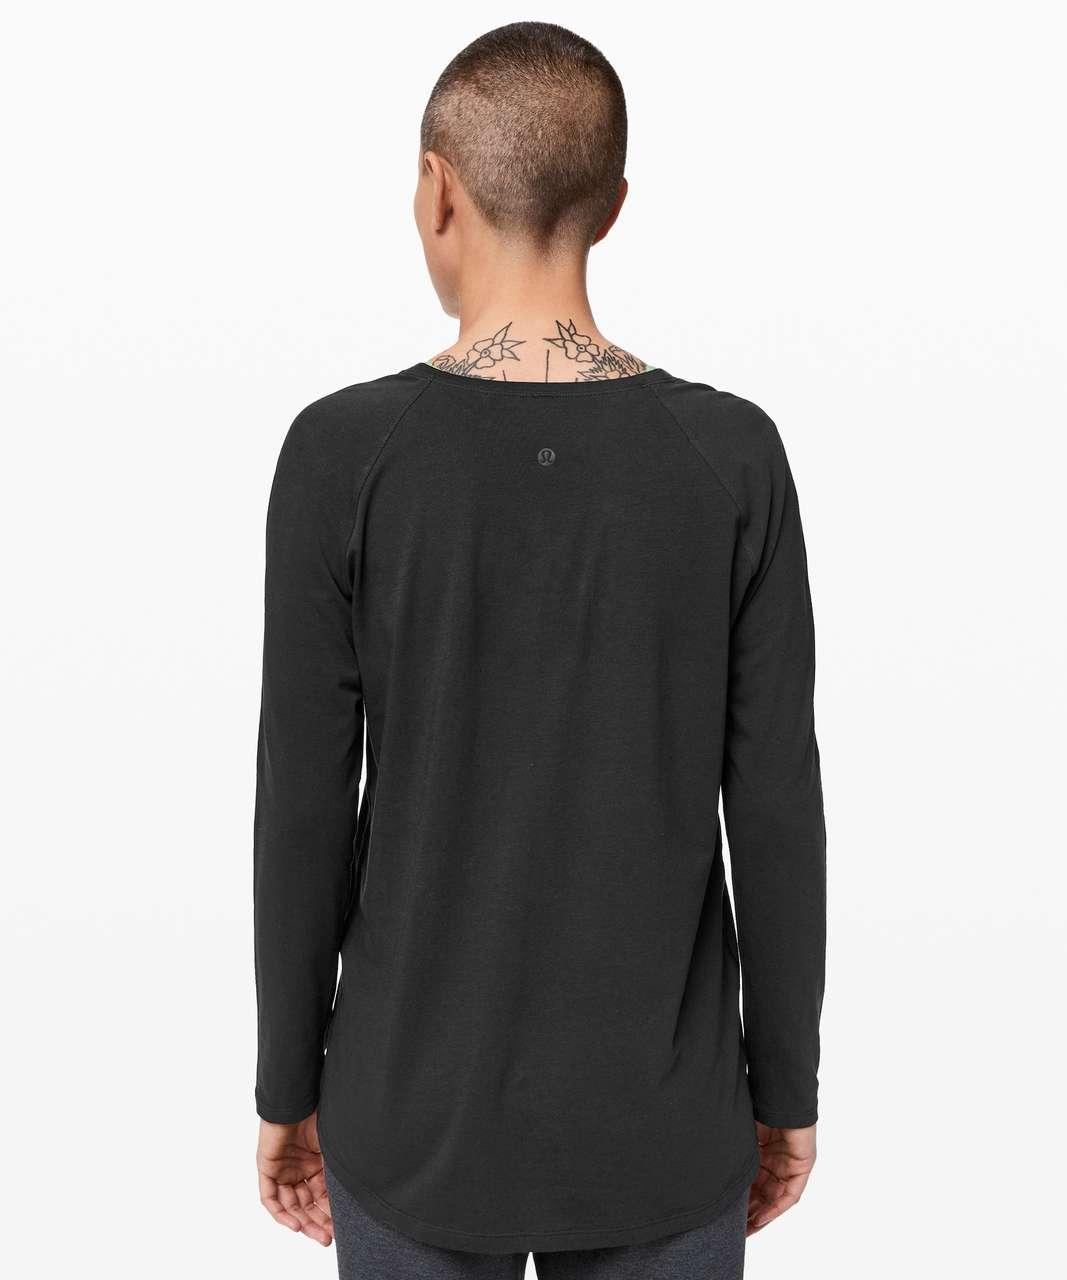 Lululemon Emerald Long Sleeve - Black